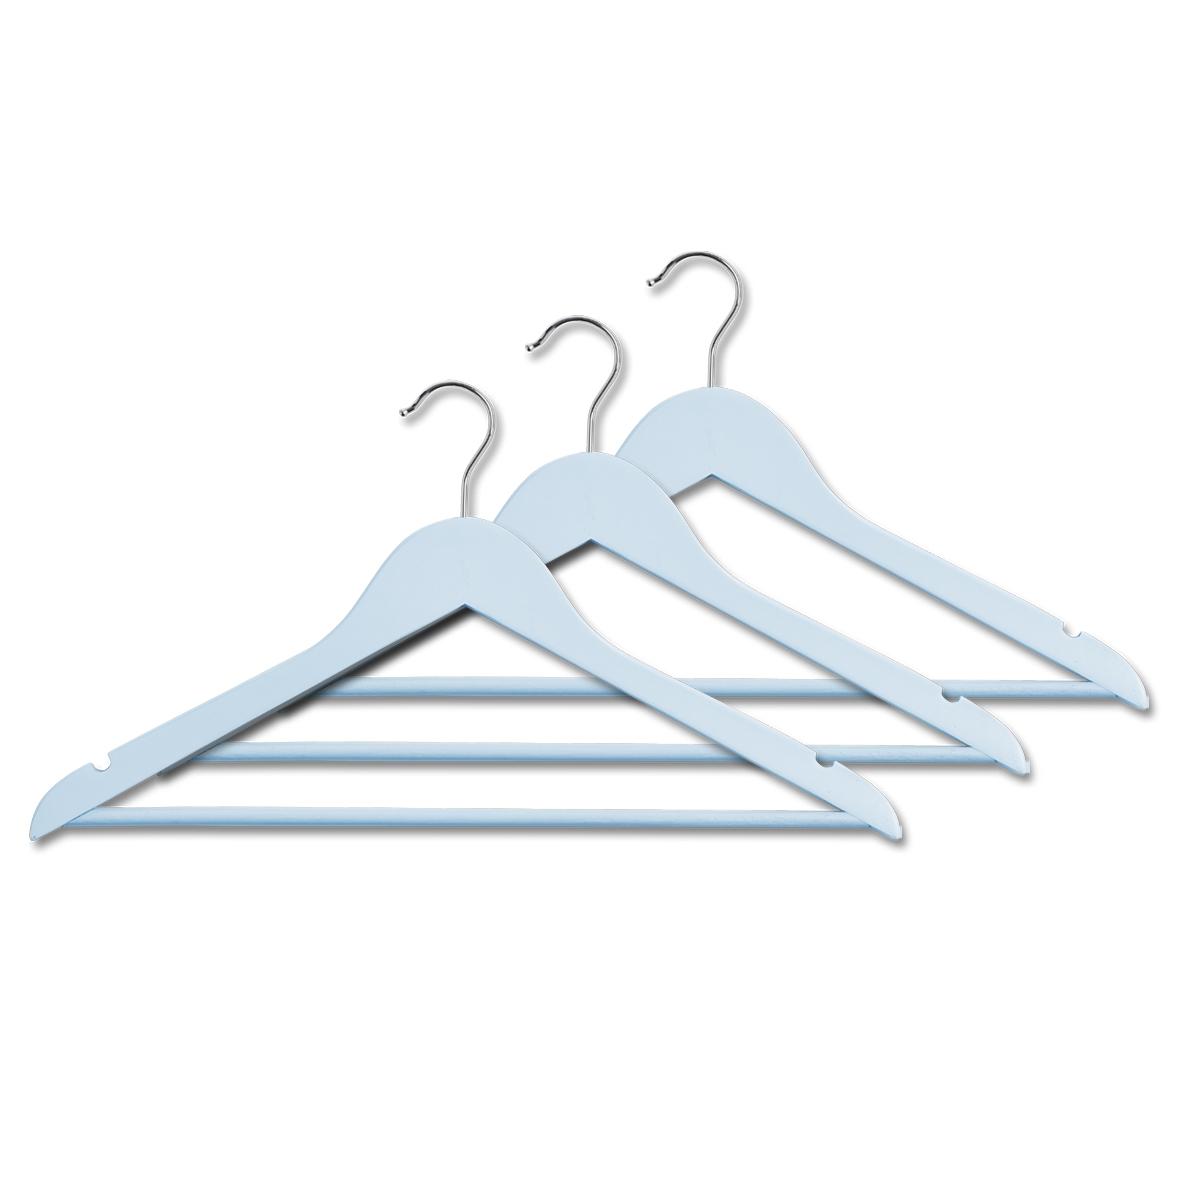 Set umerase din lemn si metal, Scandi Albastru, l44xH23 cm, 3 bucati imagine